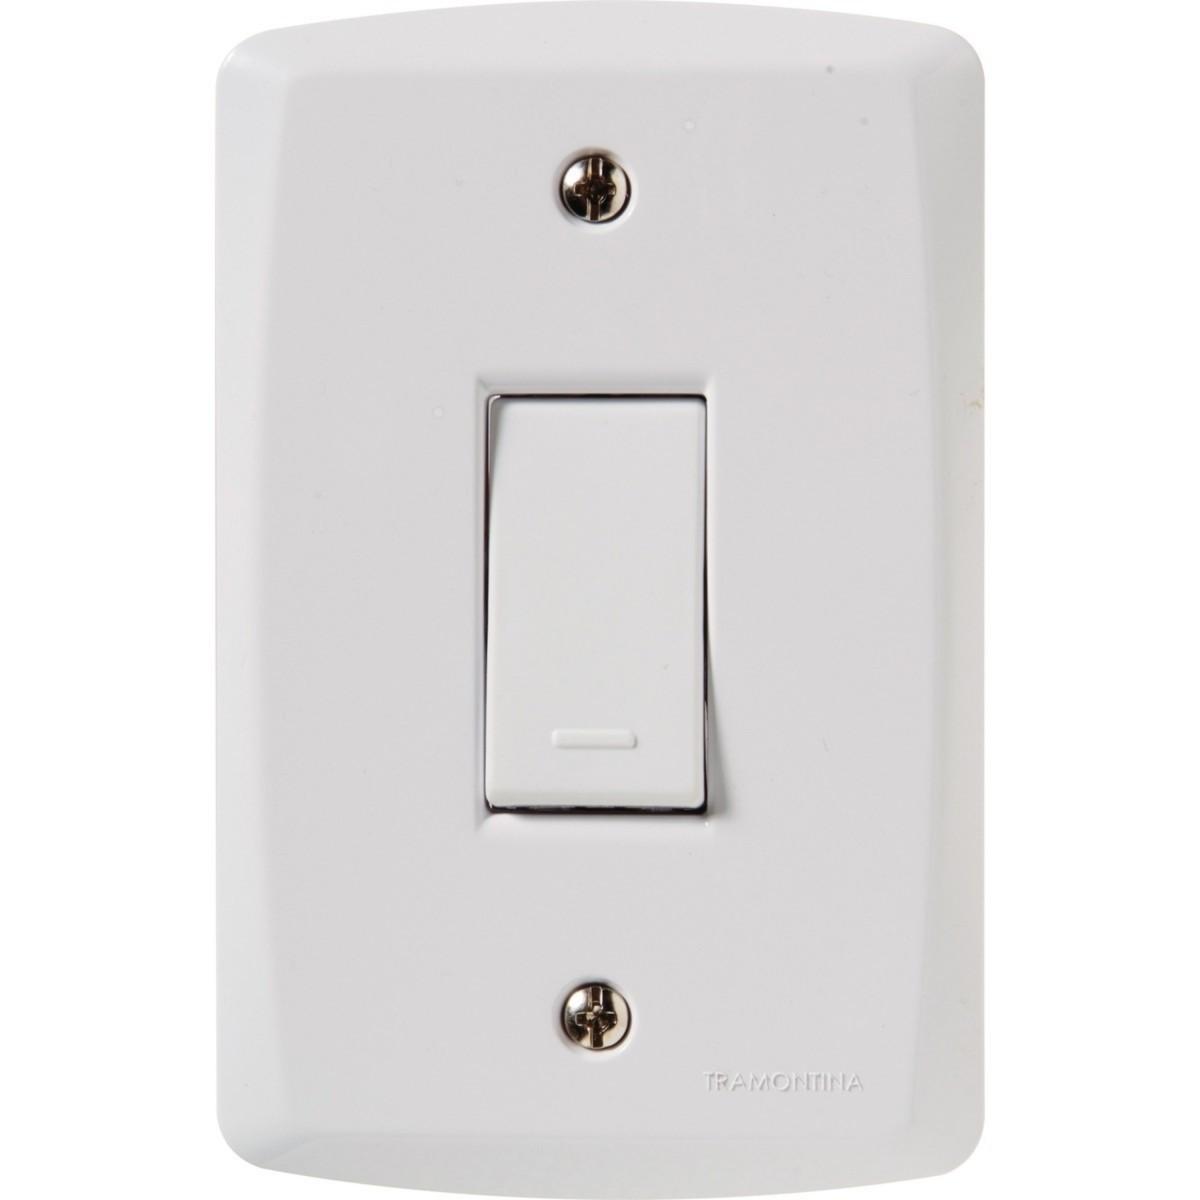 Elétrica Conjunto Interruptores Simples 10A/250V Tramontina